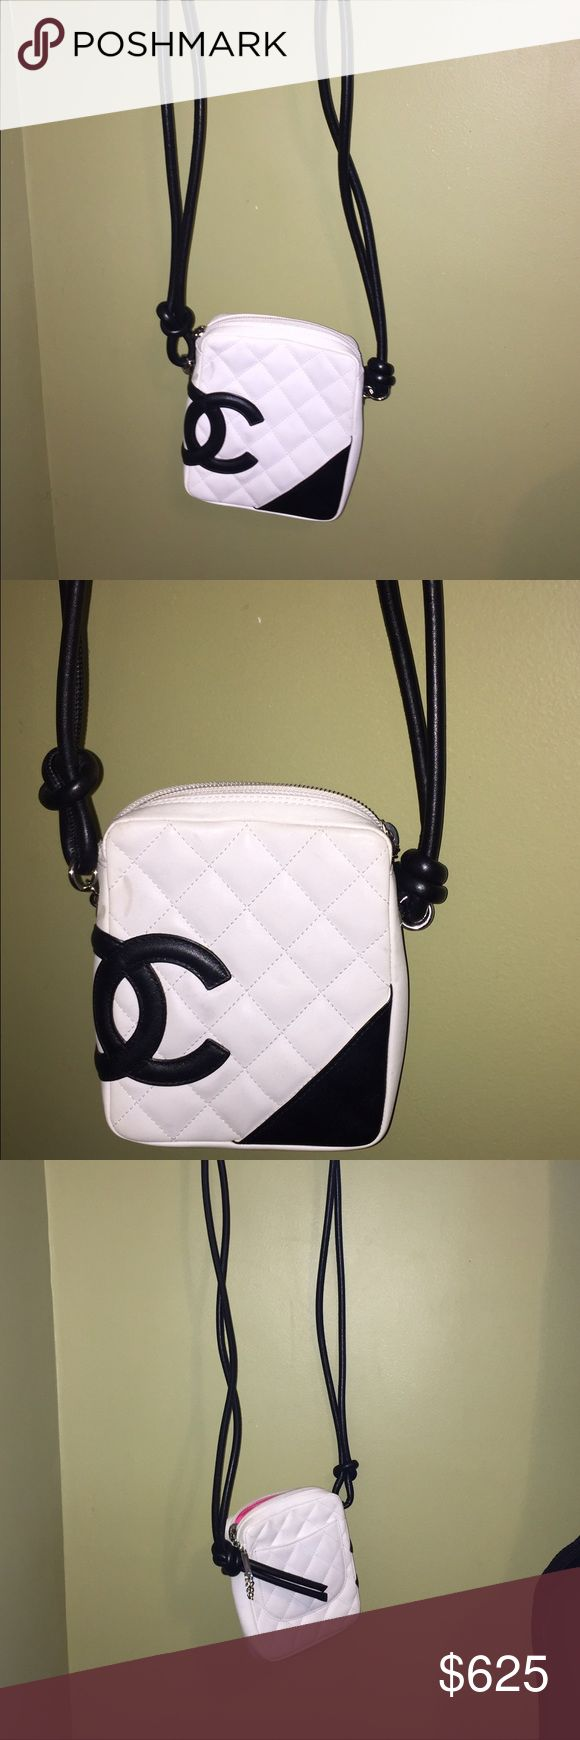 AUTHENTIC CHANEL LIGNE CAMBON CROSSBODY BAG CHANEL LIGNE CAMBON CROSSBODY BAG. BLACK AND WHITE. CHANEL Bags Crossbody Bags